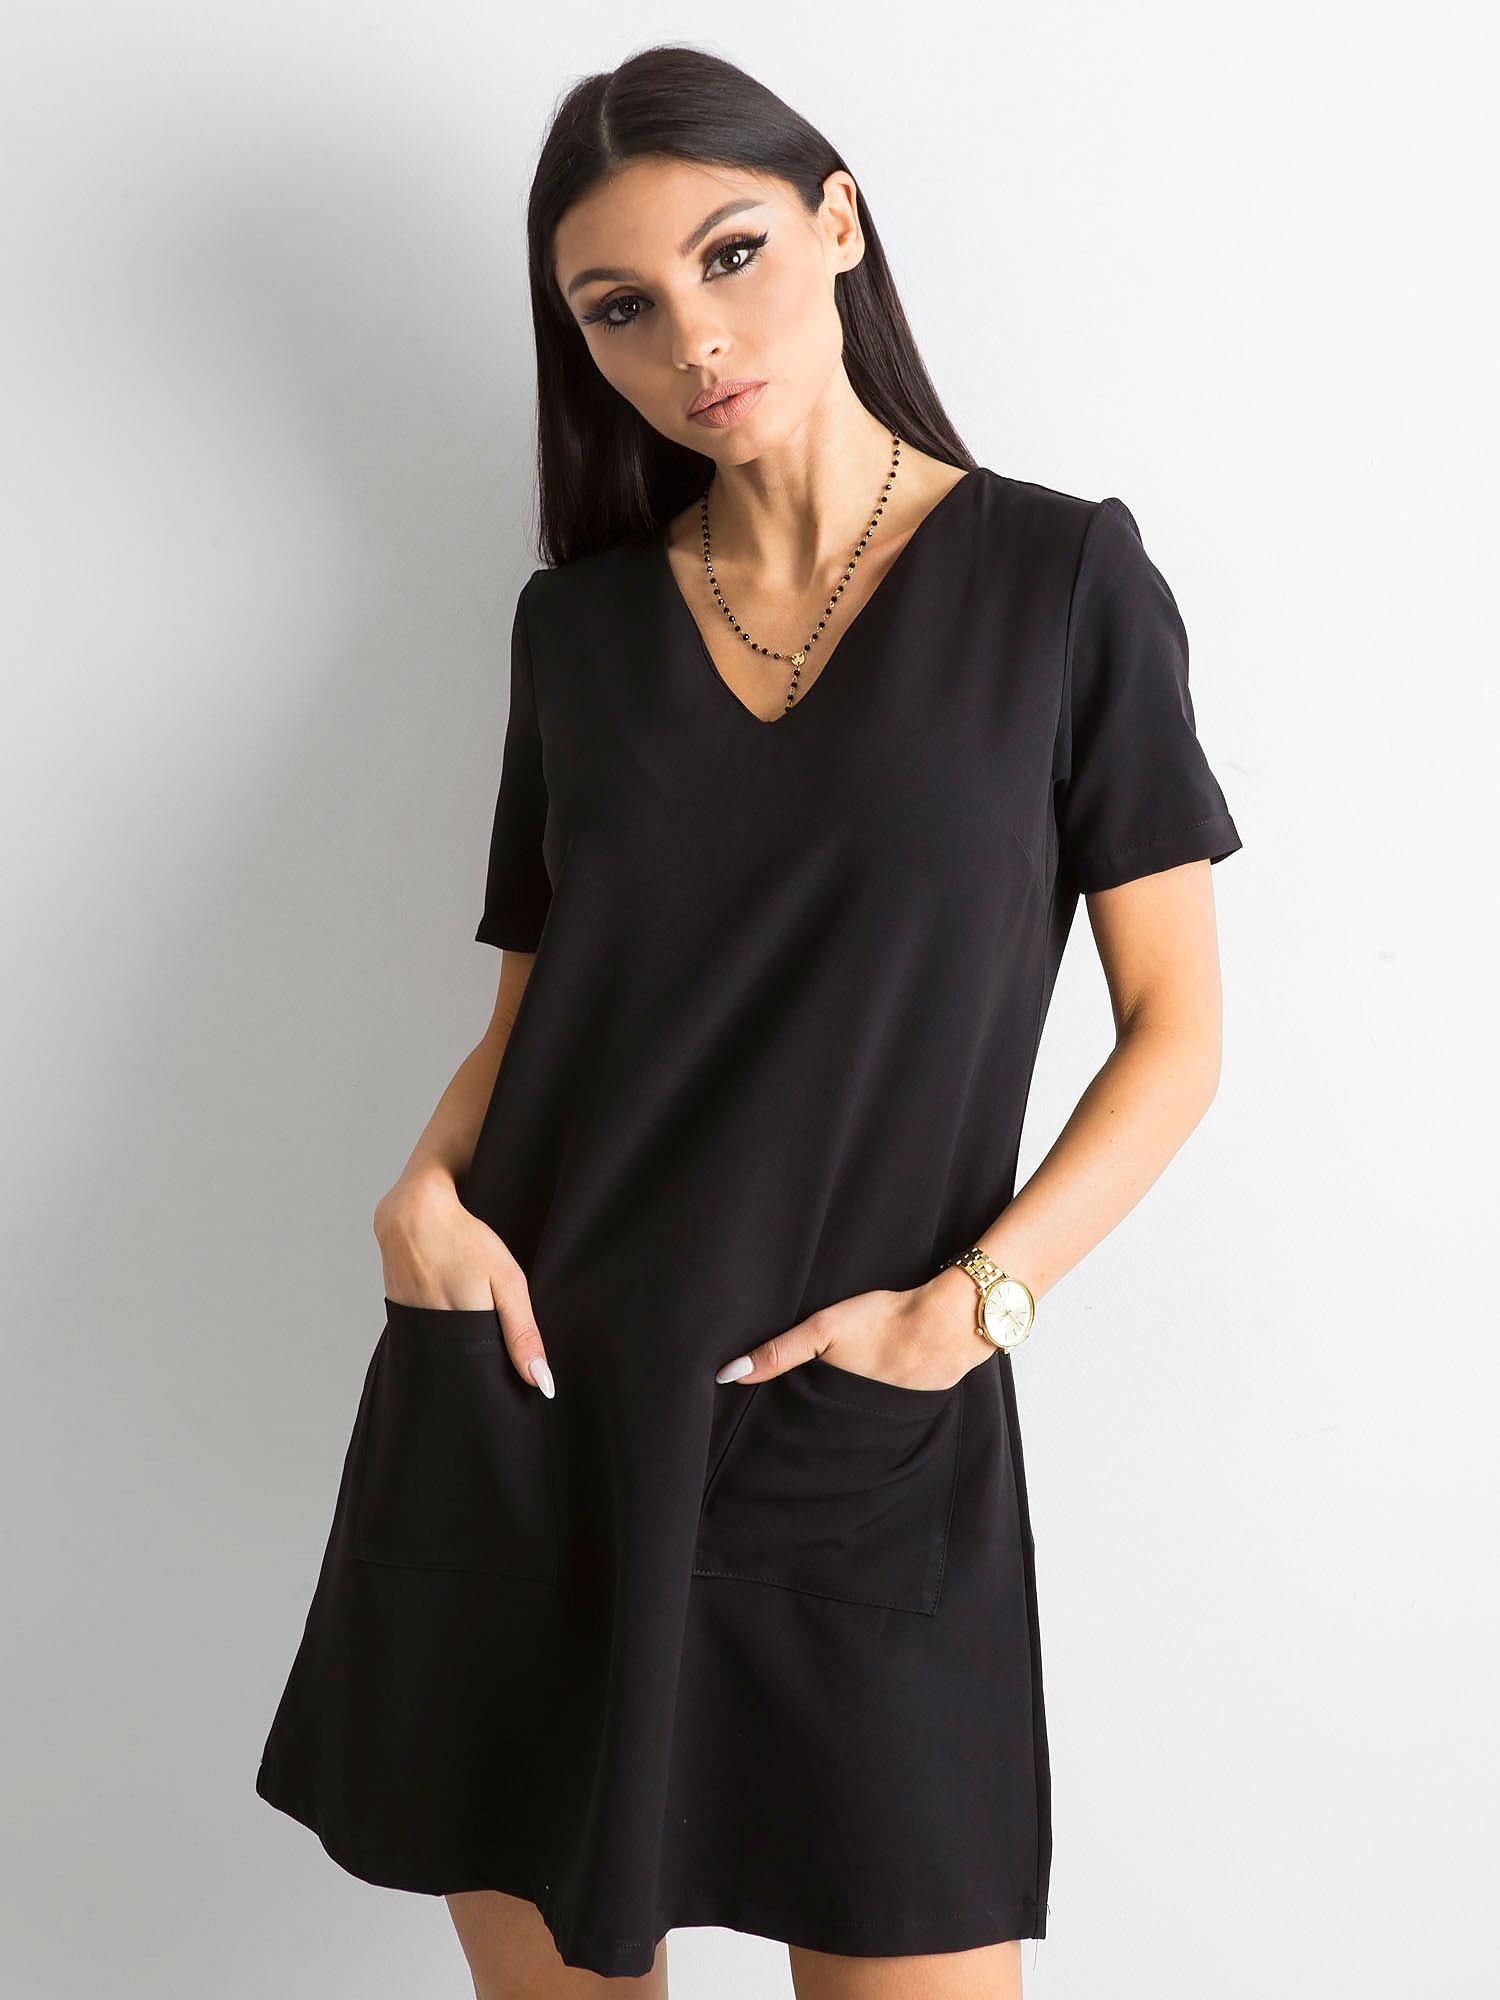 d15514db54 Czarna sukienka damska z kieszeniami - Sukienka koktajlowa - sklep ...